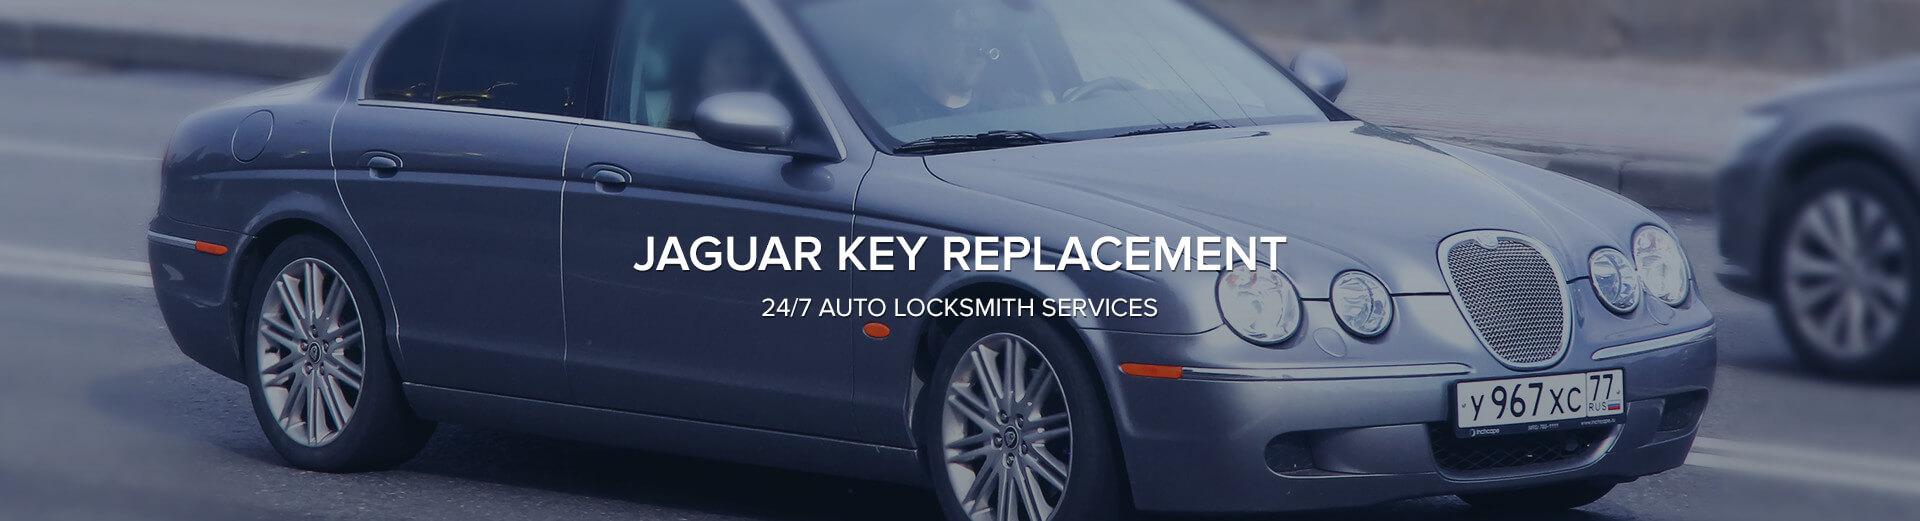 locksmith replacement dallas keys key experts pro services jaguar car